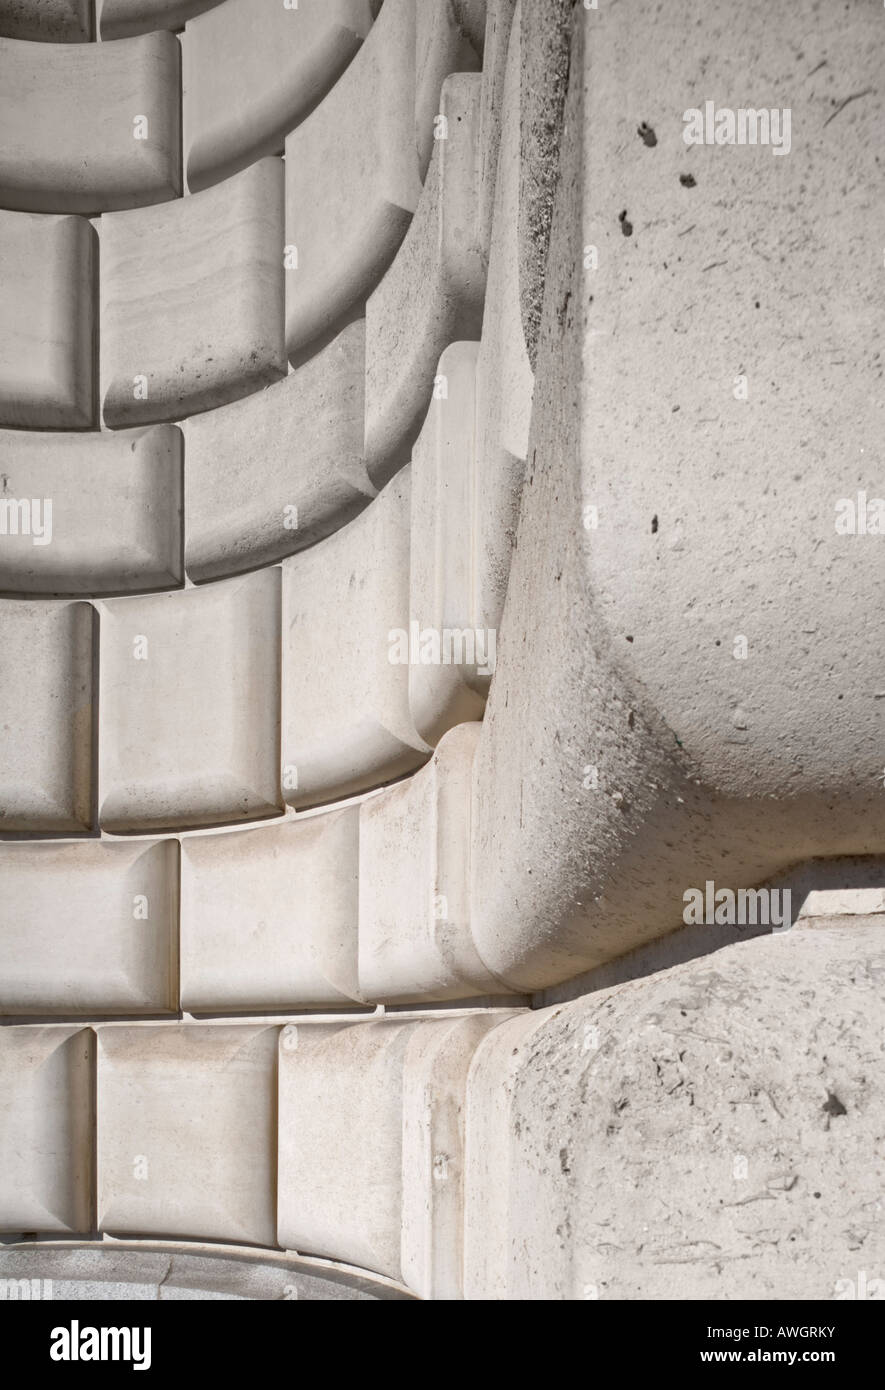 Unilever House at Blackfriars London - Stock Image